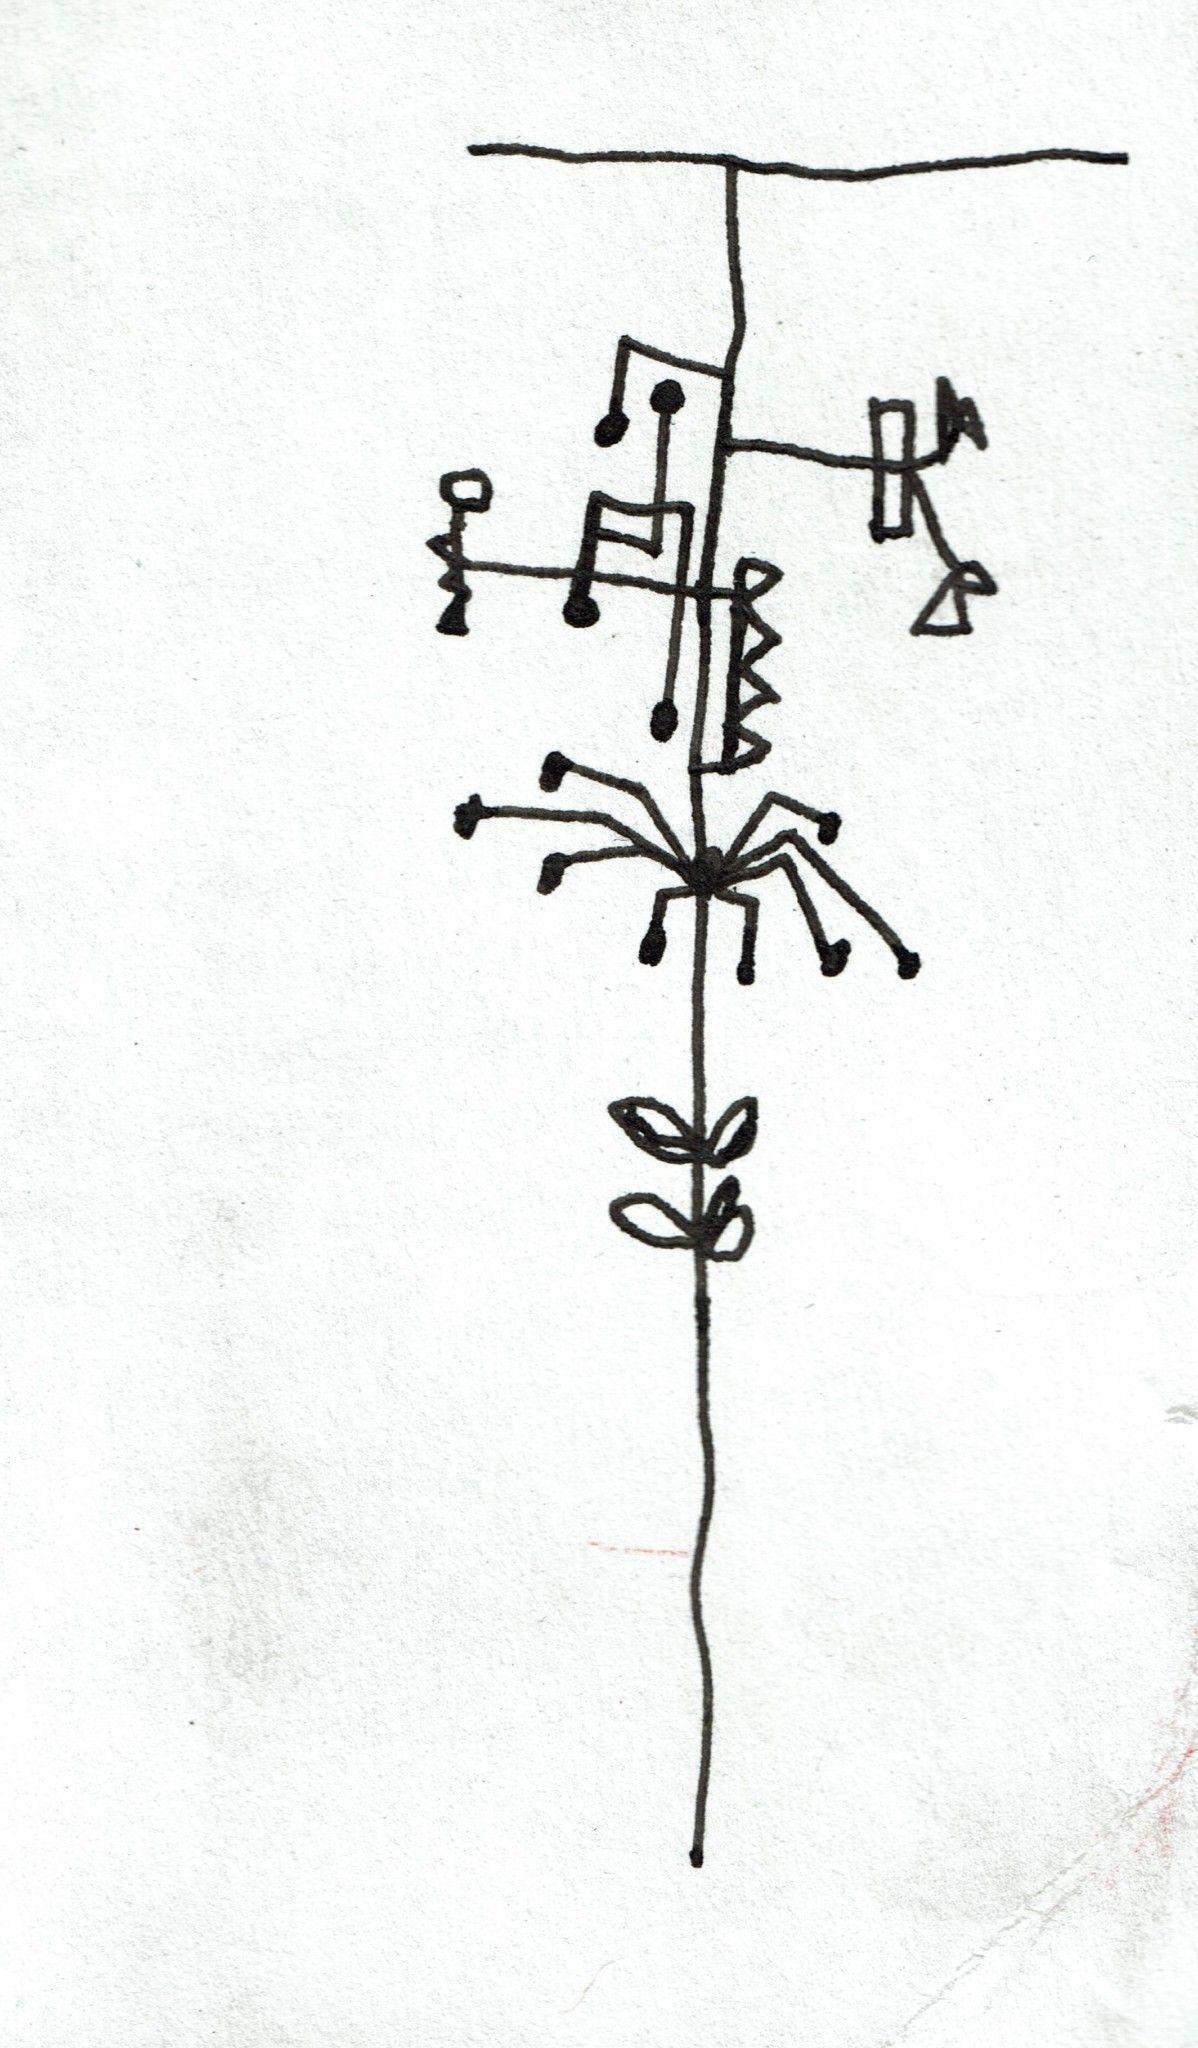 Araña creativa